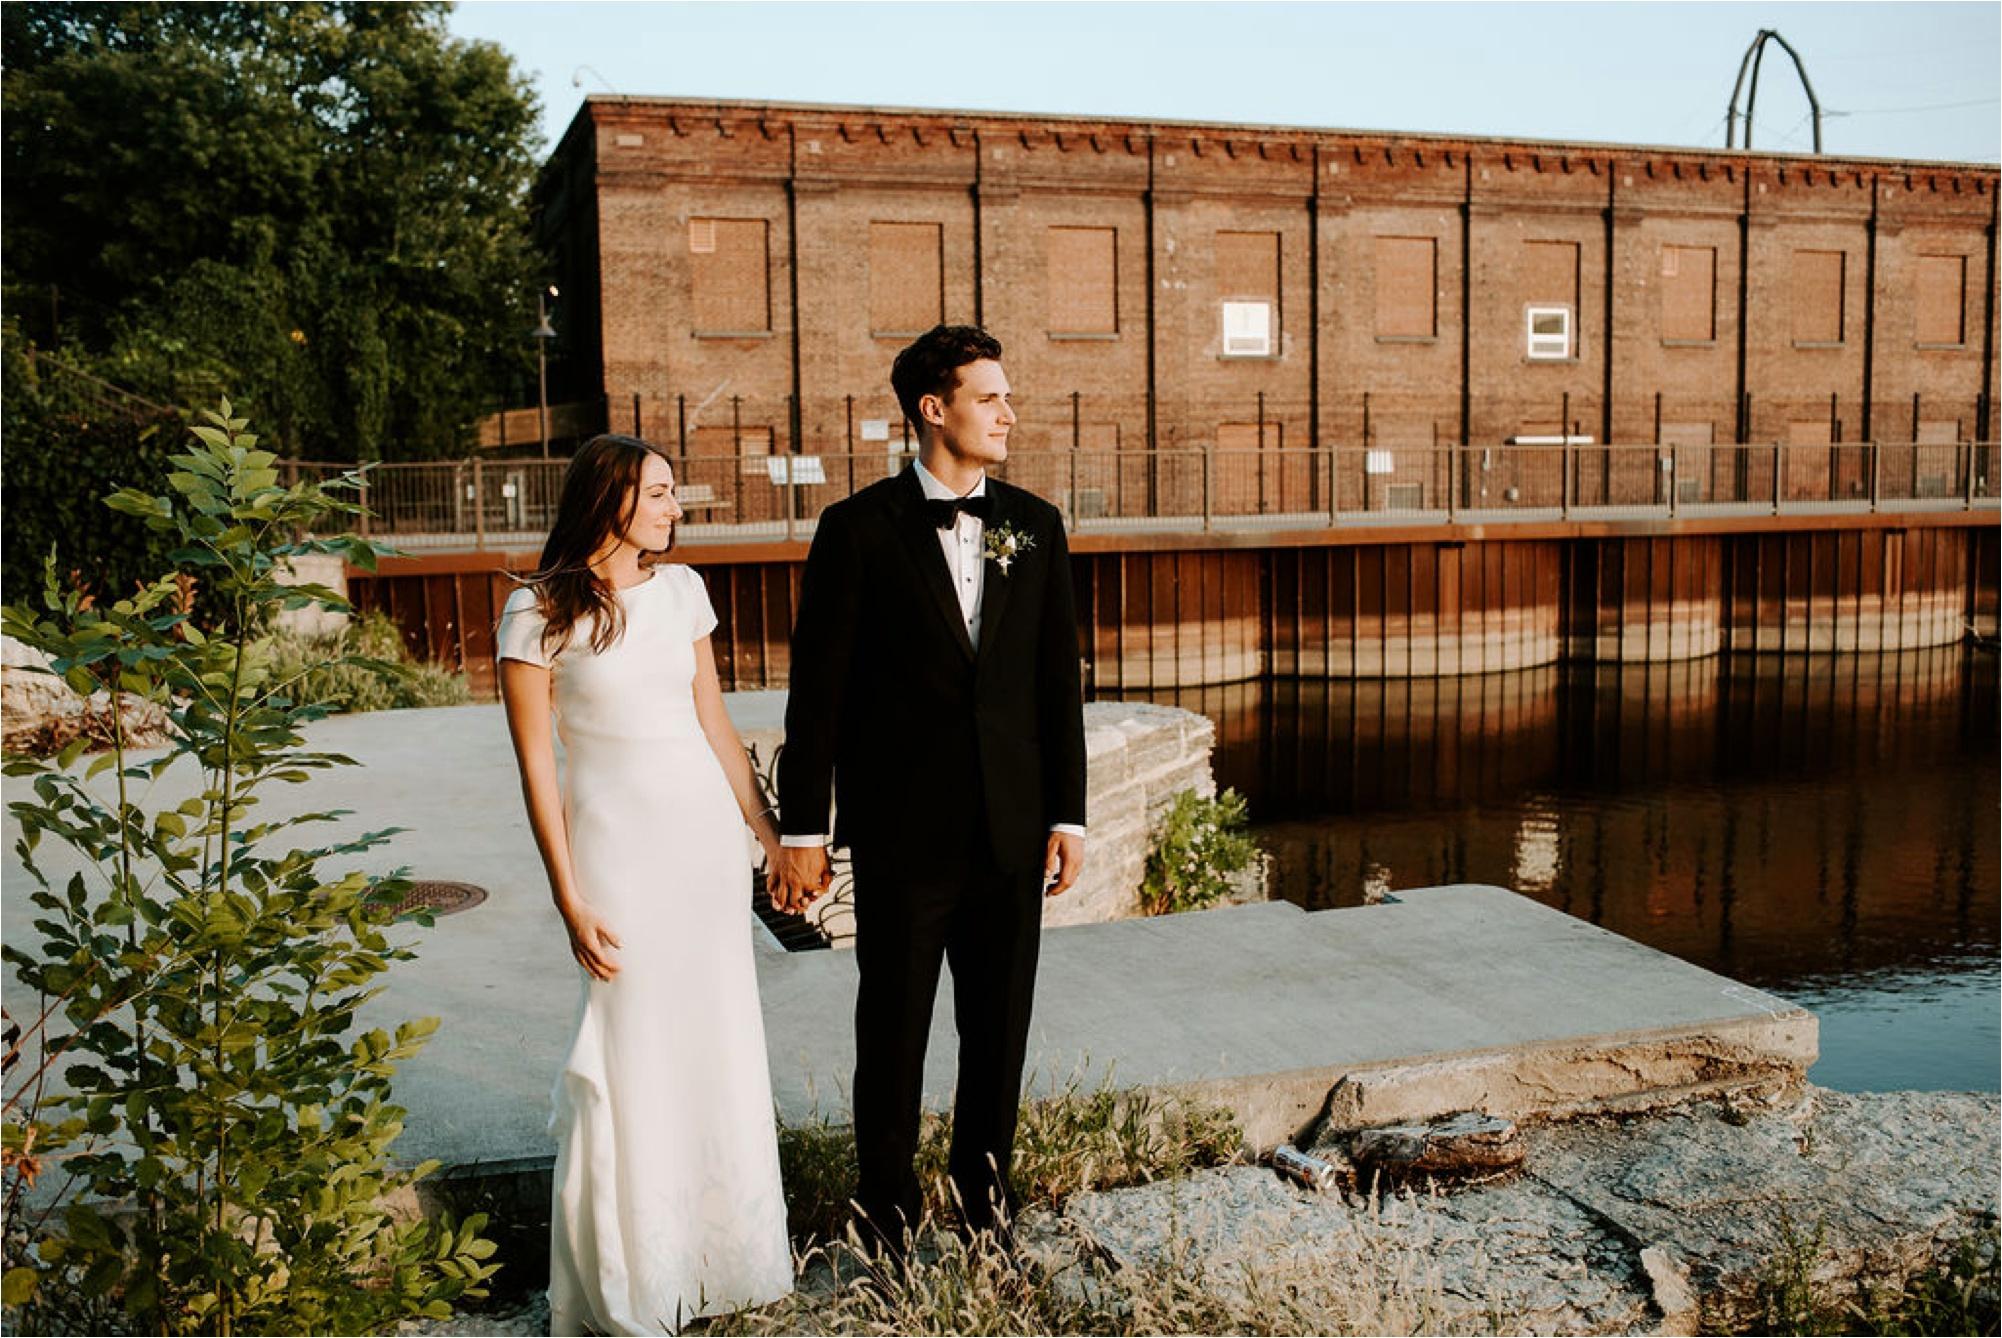 st anthony main minneapolis wedding photos bride and groom